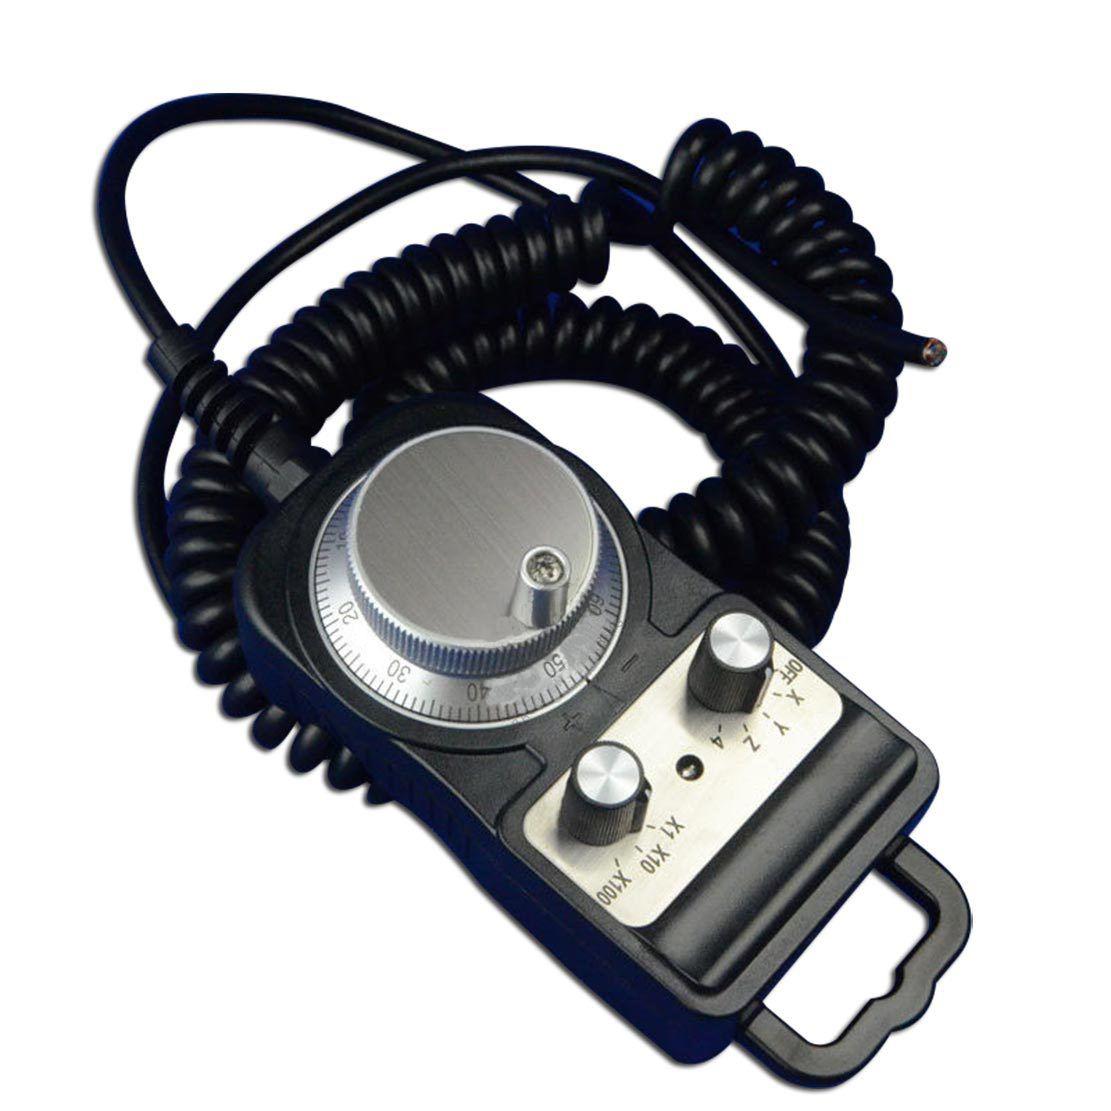 5V 100PPR Electronic Hand Wheel Encoder Router Manual Pulse Generator